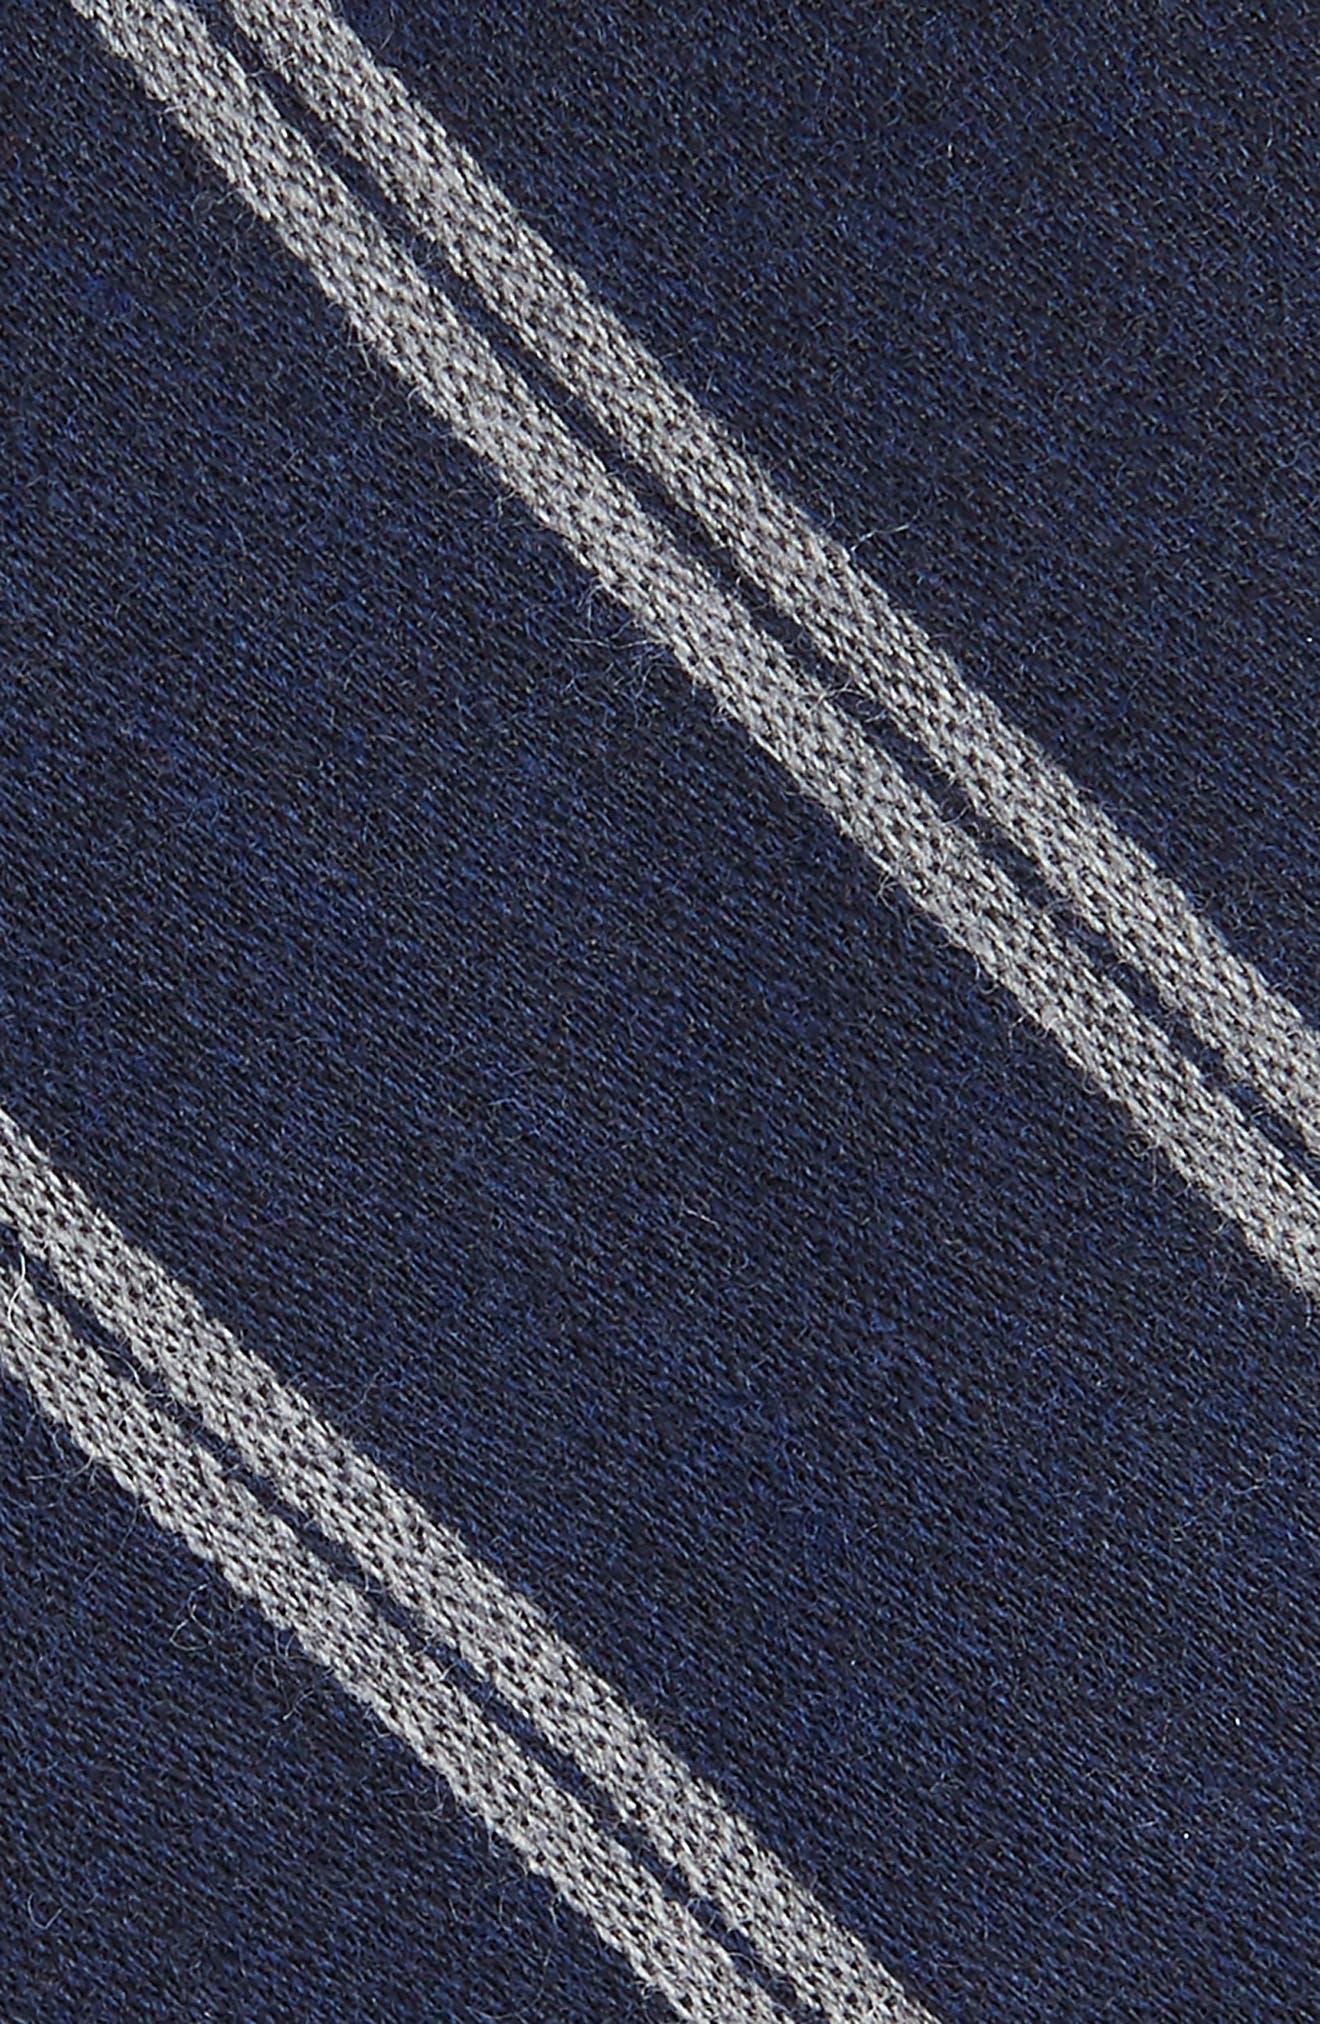 Deo Stripe Wool Tie,                             Alternate thumbnail 2, color,                             410